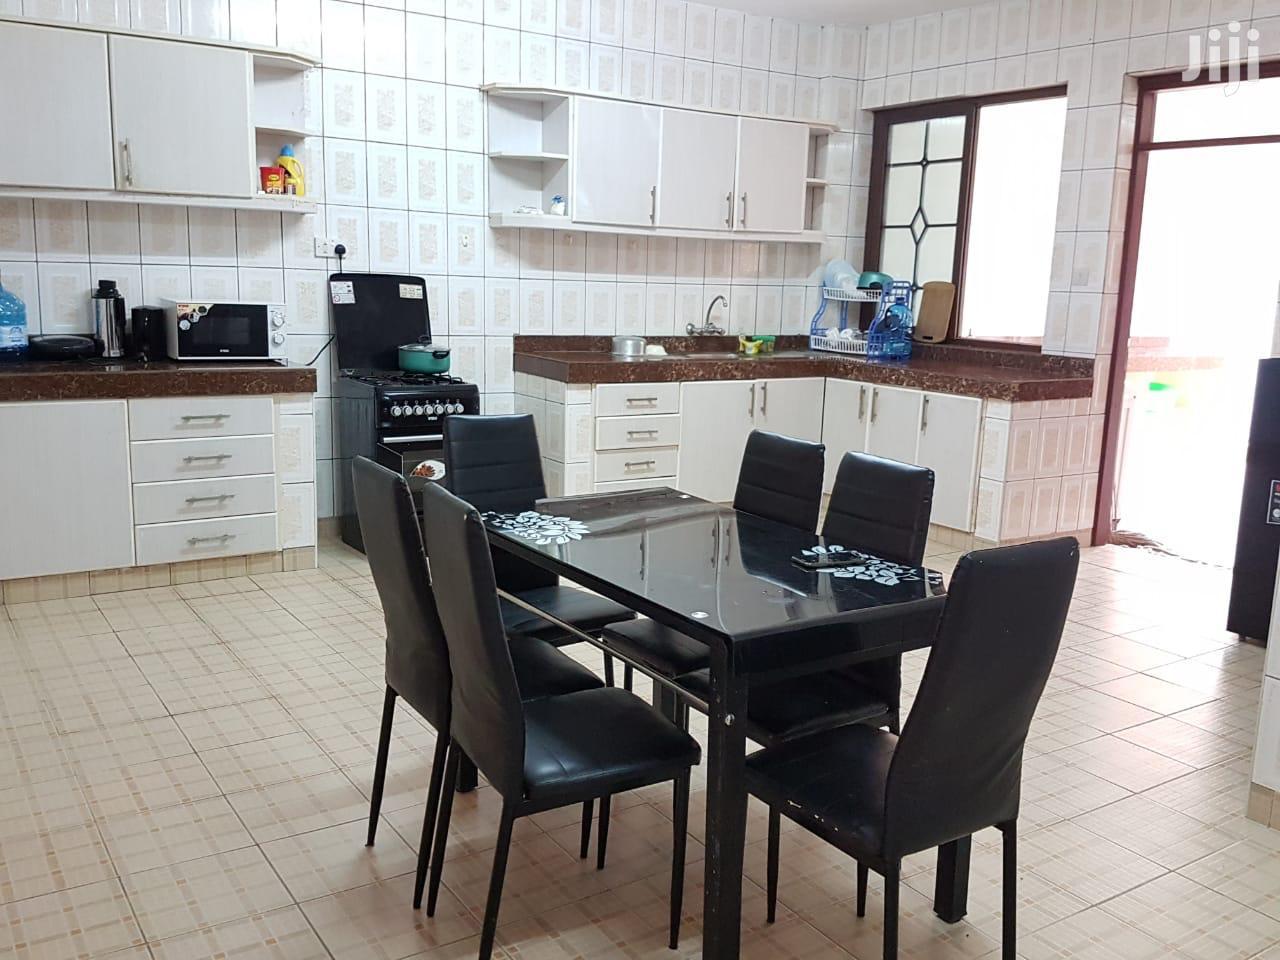 4 Bedrooms Apartments | Short Let for sale in Nyali, Mombasa, Kenya